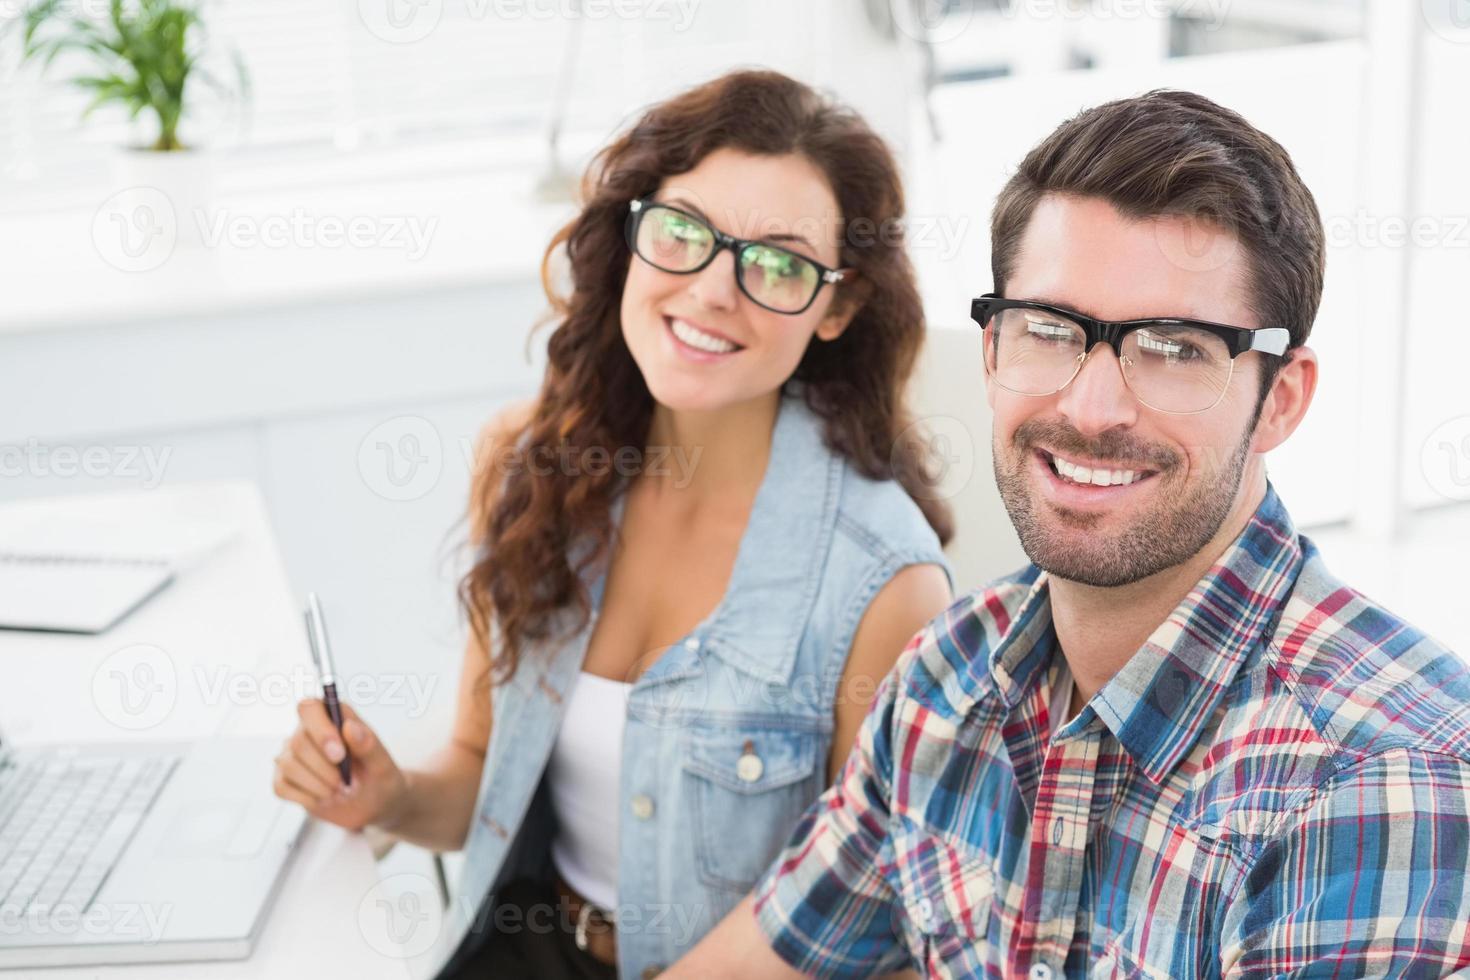 portret van glimlachende collega's met een bril foto